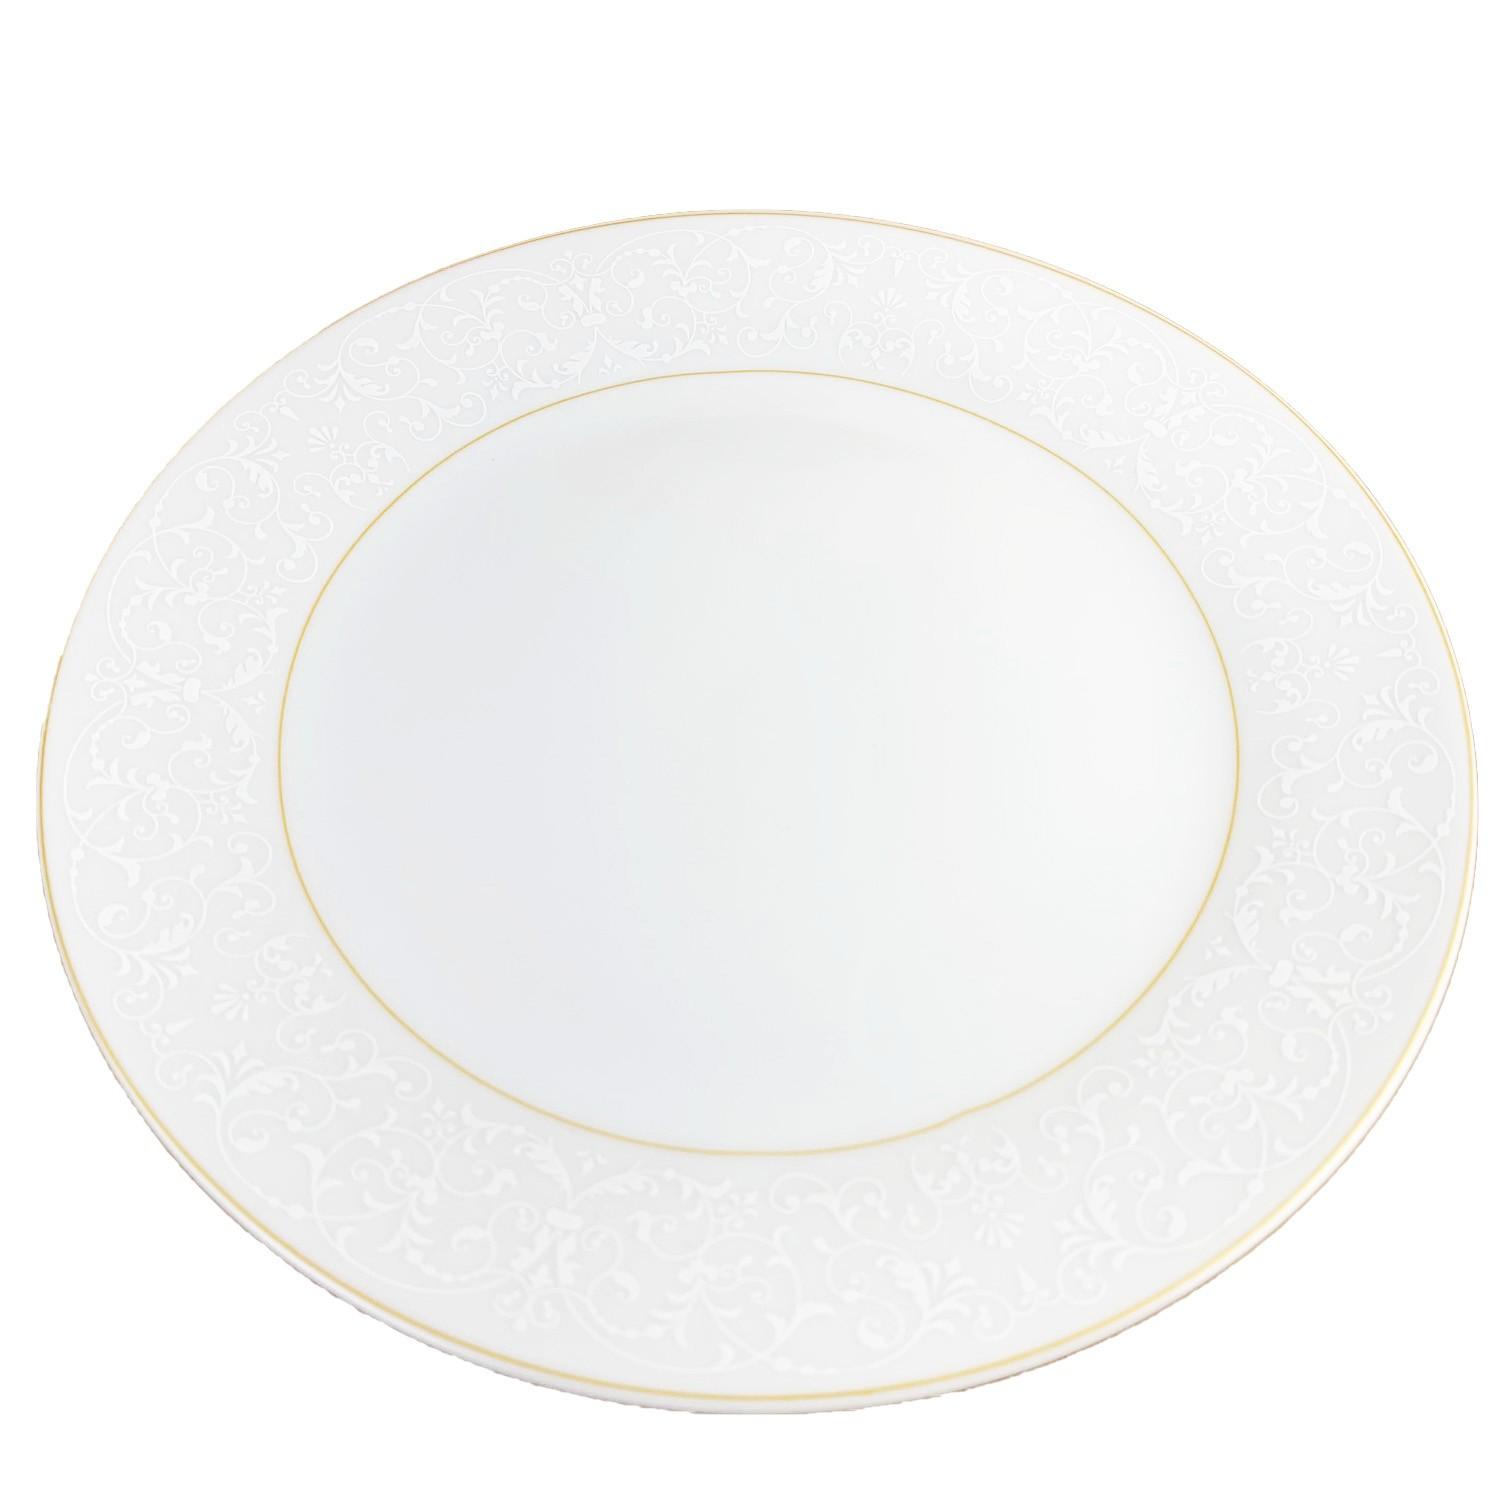 Jogo c/2 pratos para sobremesa Wolff c/filete dourado